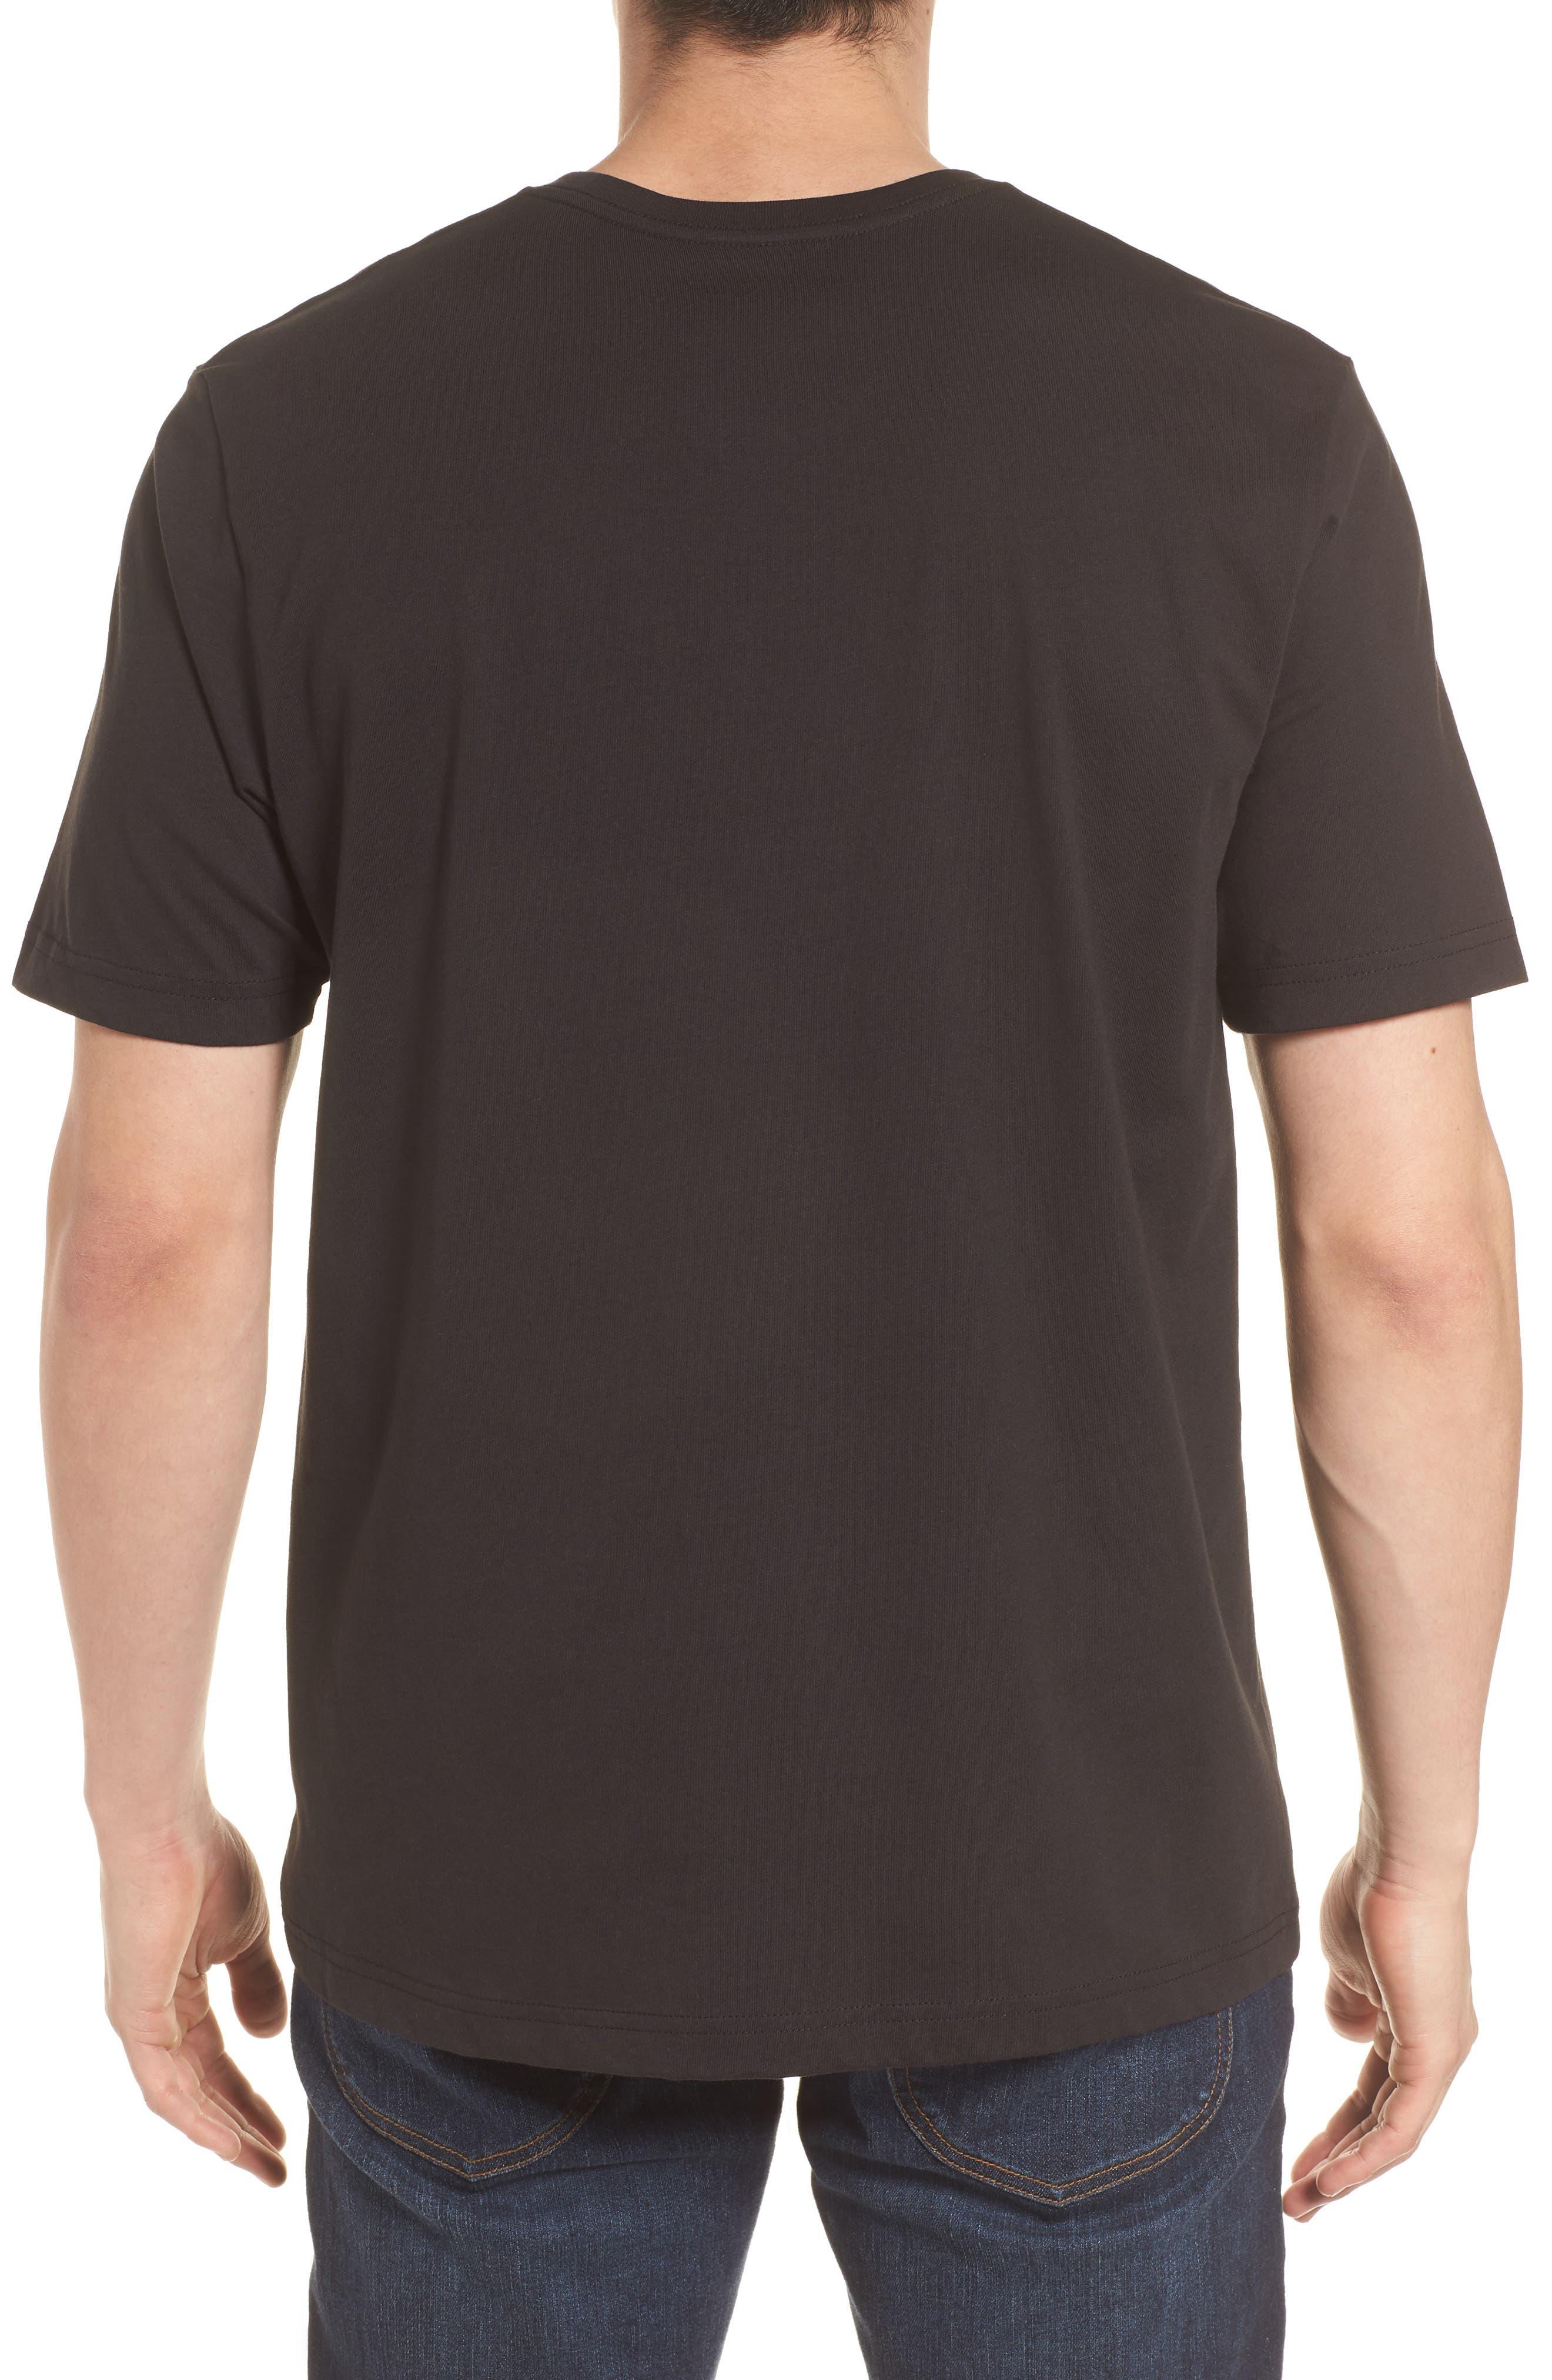 B-Stern Graphic T-Shirt,                             Alternate thumbnail 2, color,                             001